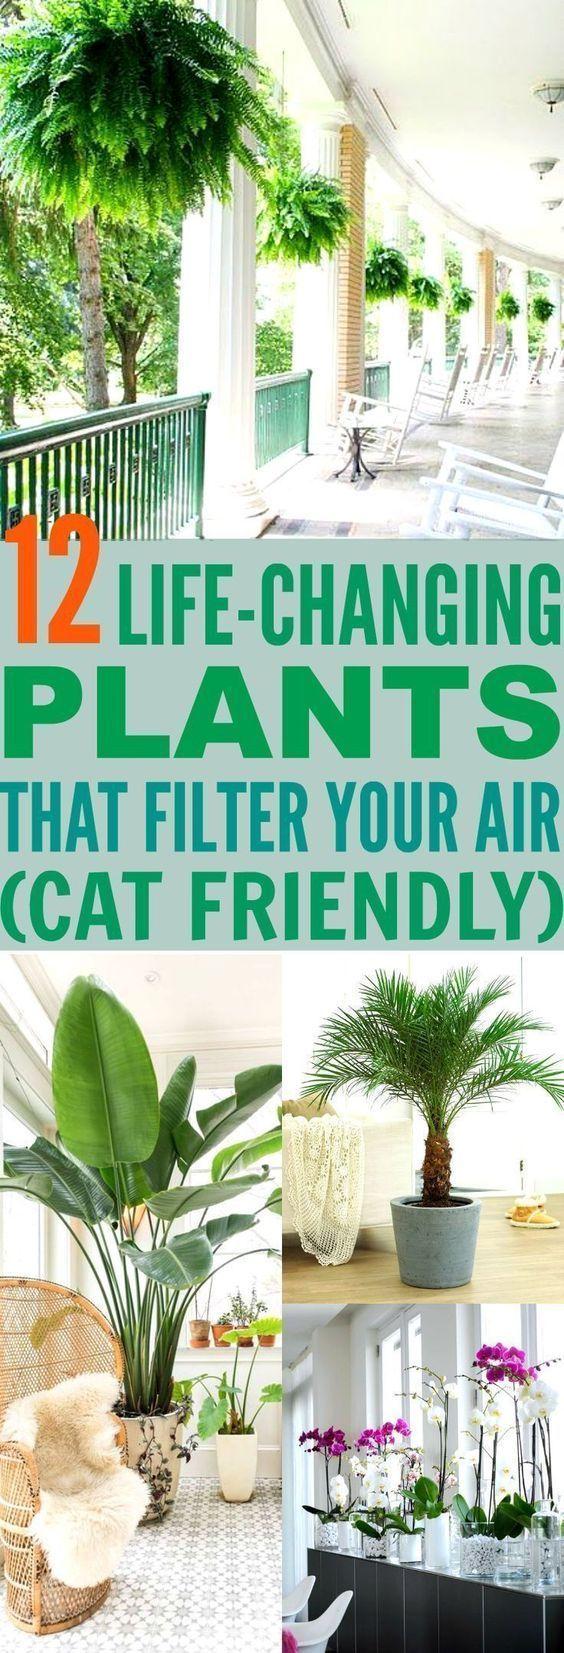 12 common house plants that filter your air all day kittens pflanzen garten pflanzen und. Black Bedroom Furniture Sets. Home Design Ideas